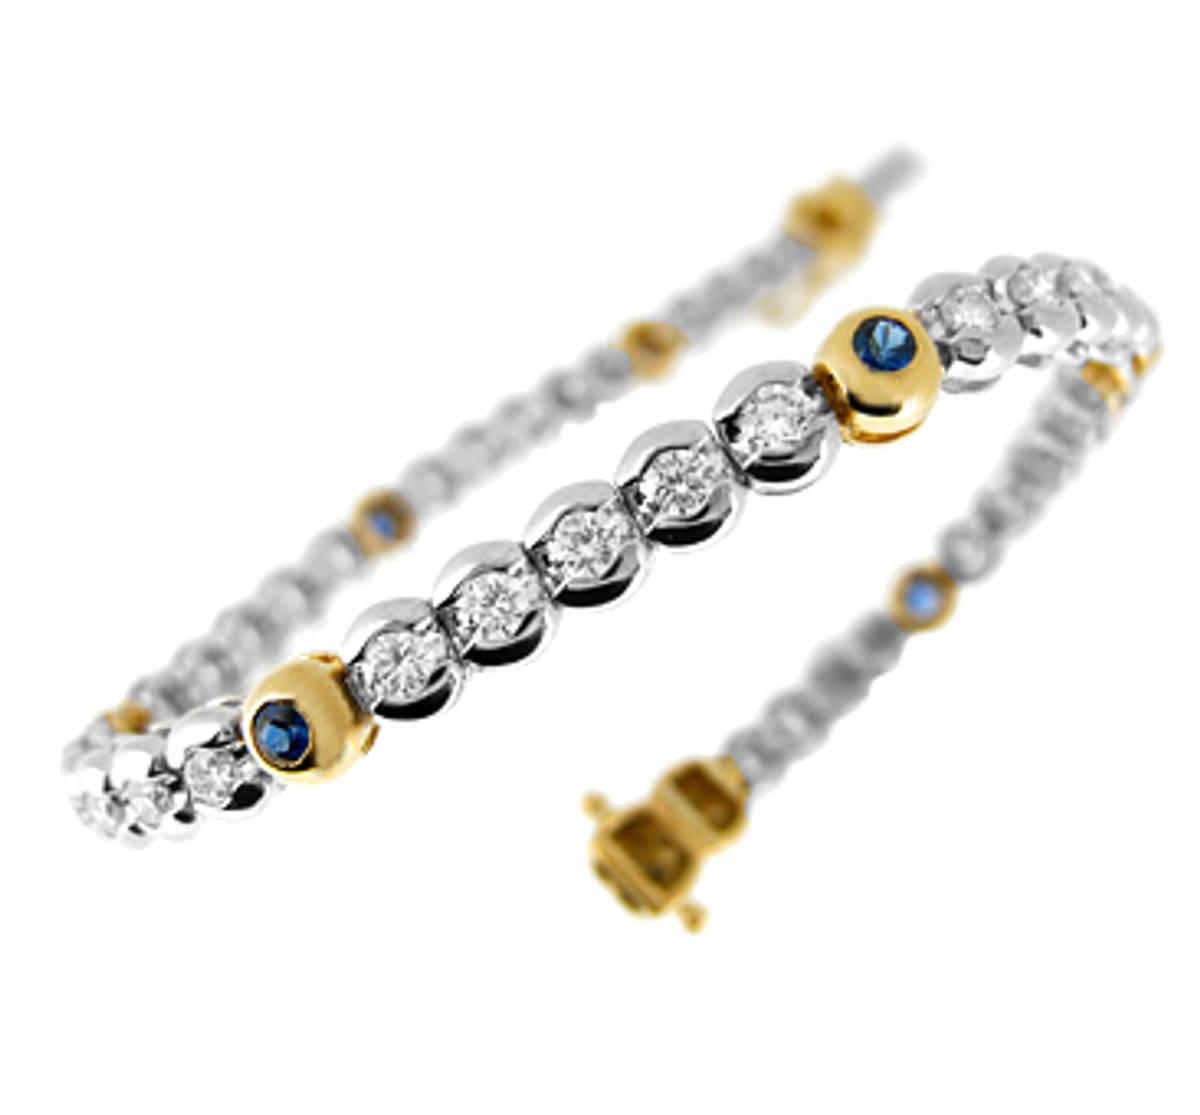 Sapphire diamond rubover set line braceletAvailable in: 18k goldPictured item: 0.70ct sapphire/2.42ct brilliant cut diamond set in 18k yellow/white gold